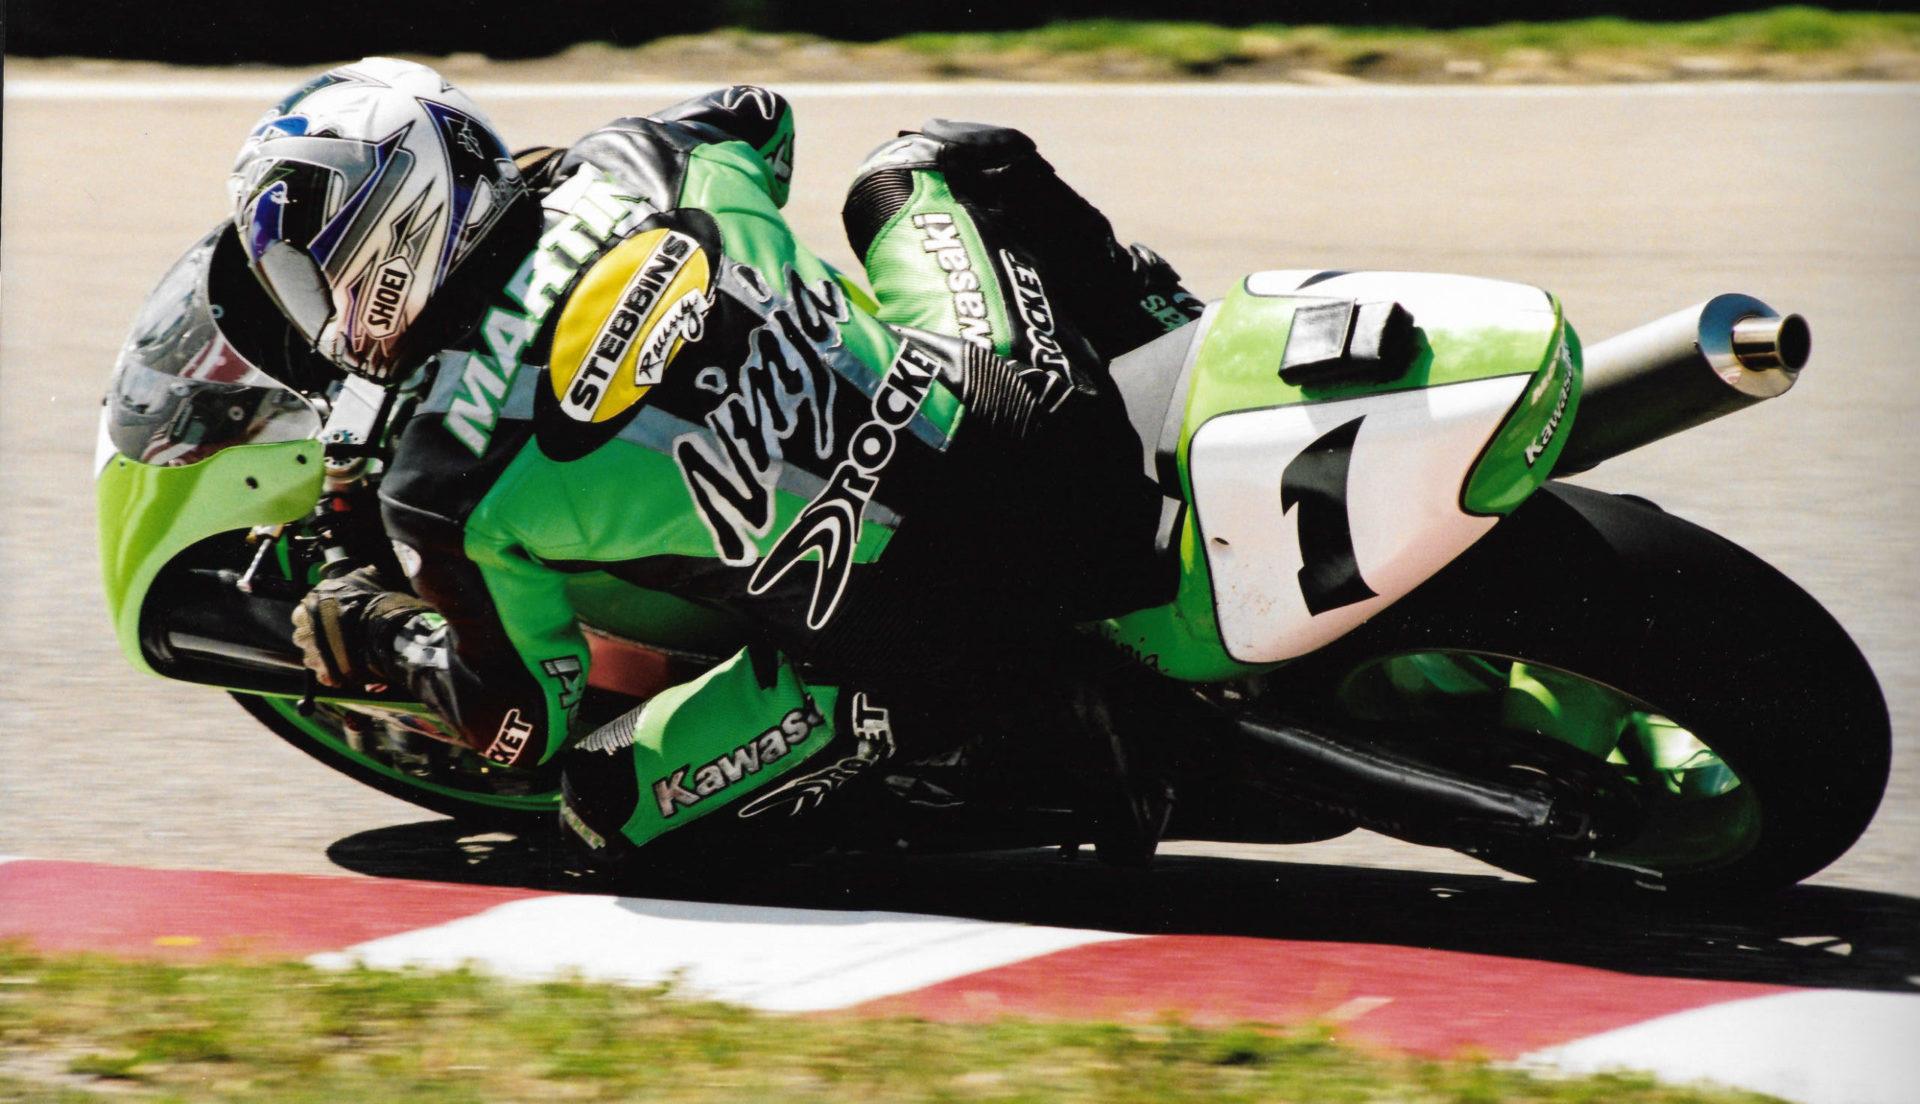 Joe Rocket-sponsored Francis Martin (1) at speed in 2000. Photo by Colin Fraser, courtesy CSBK.